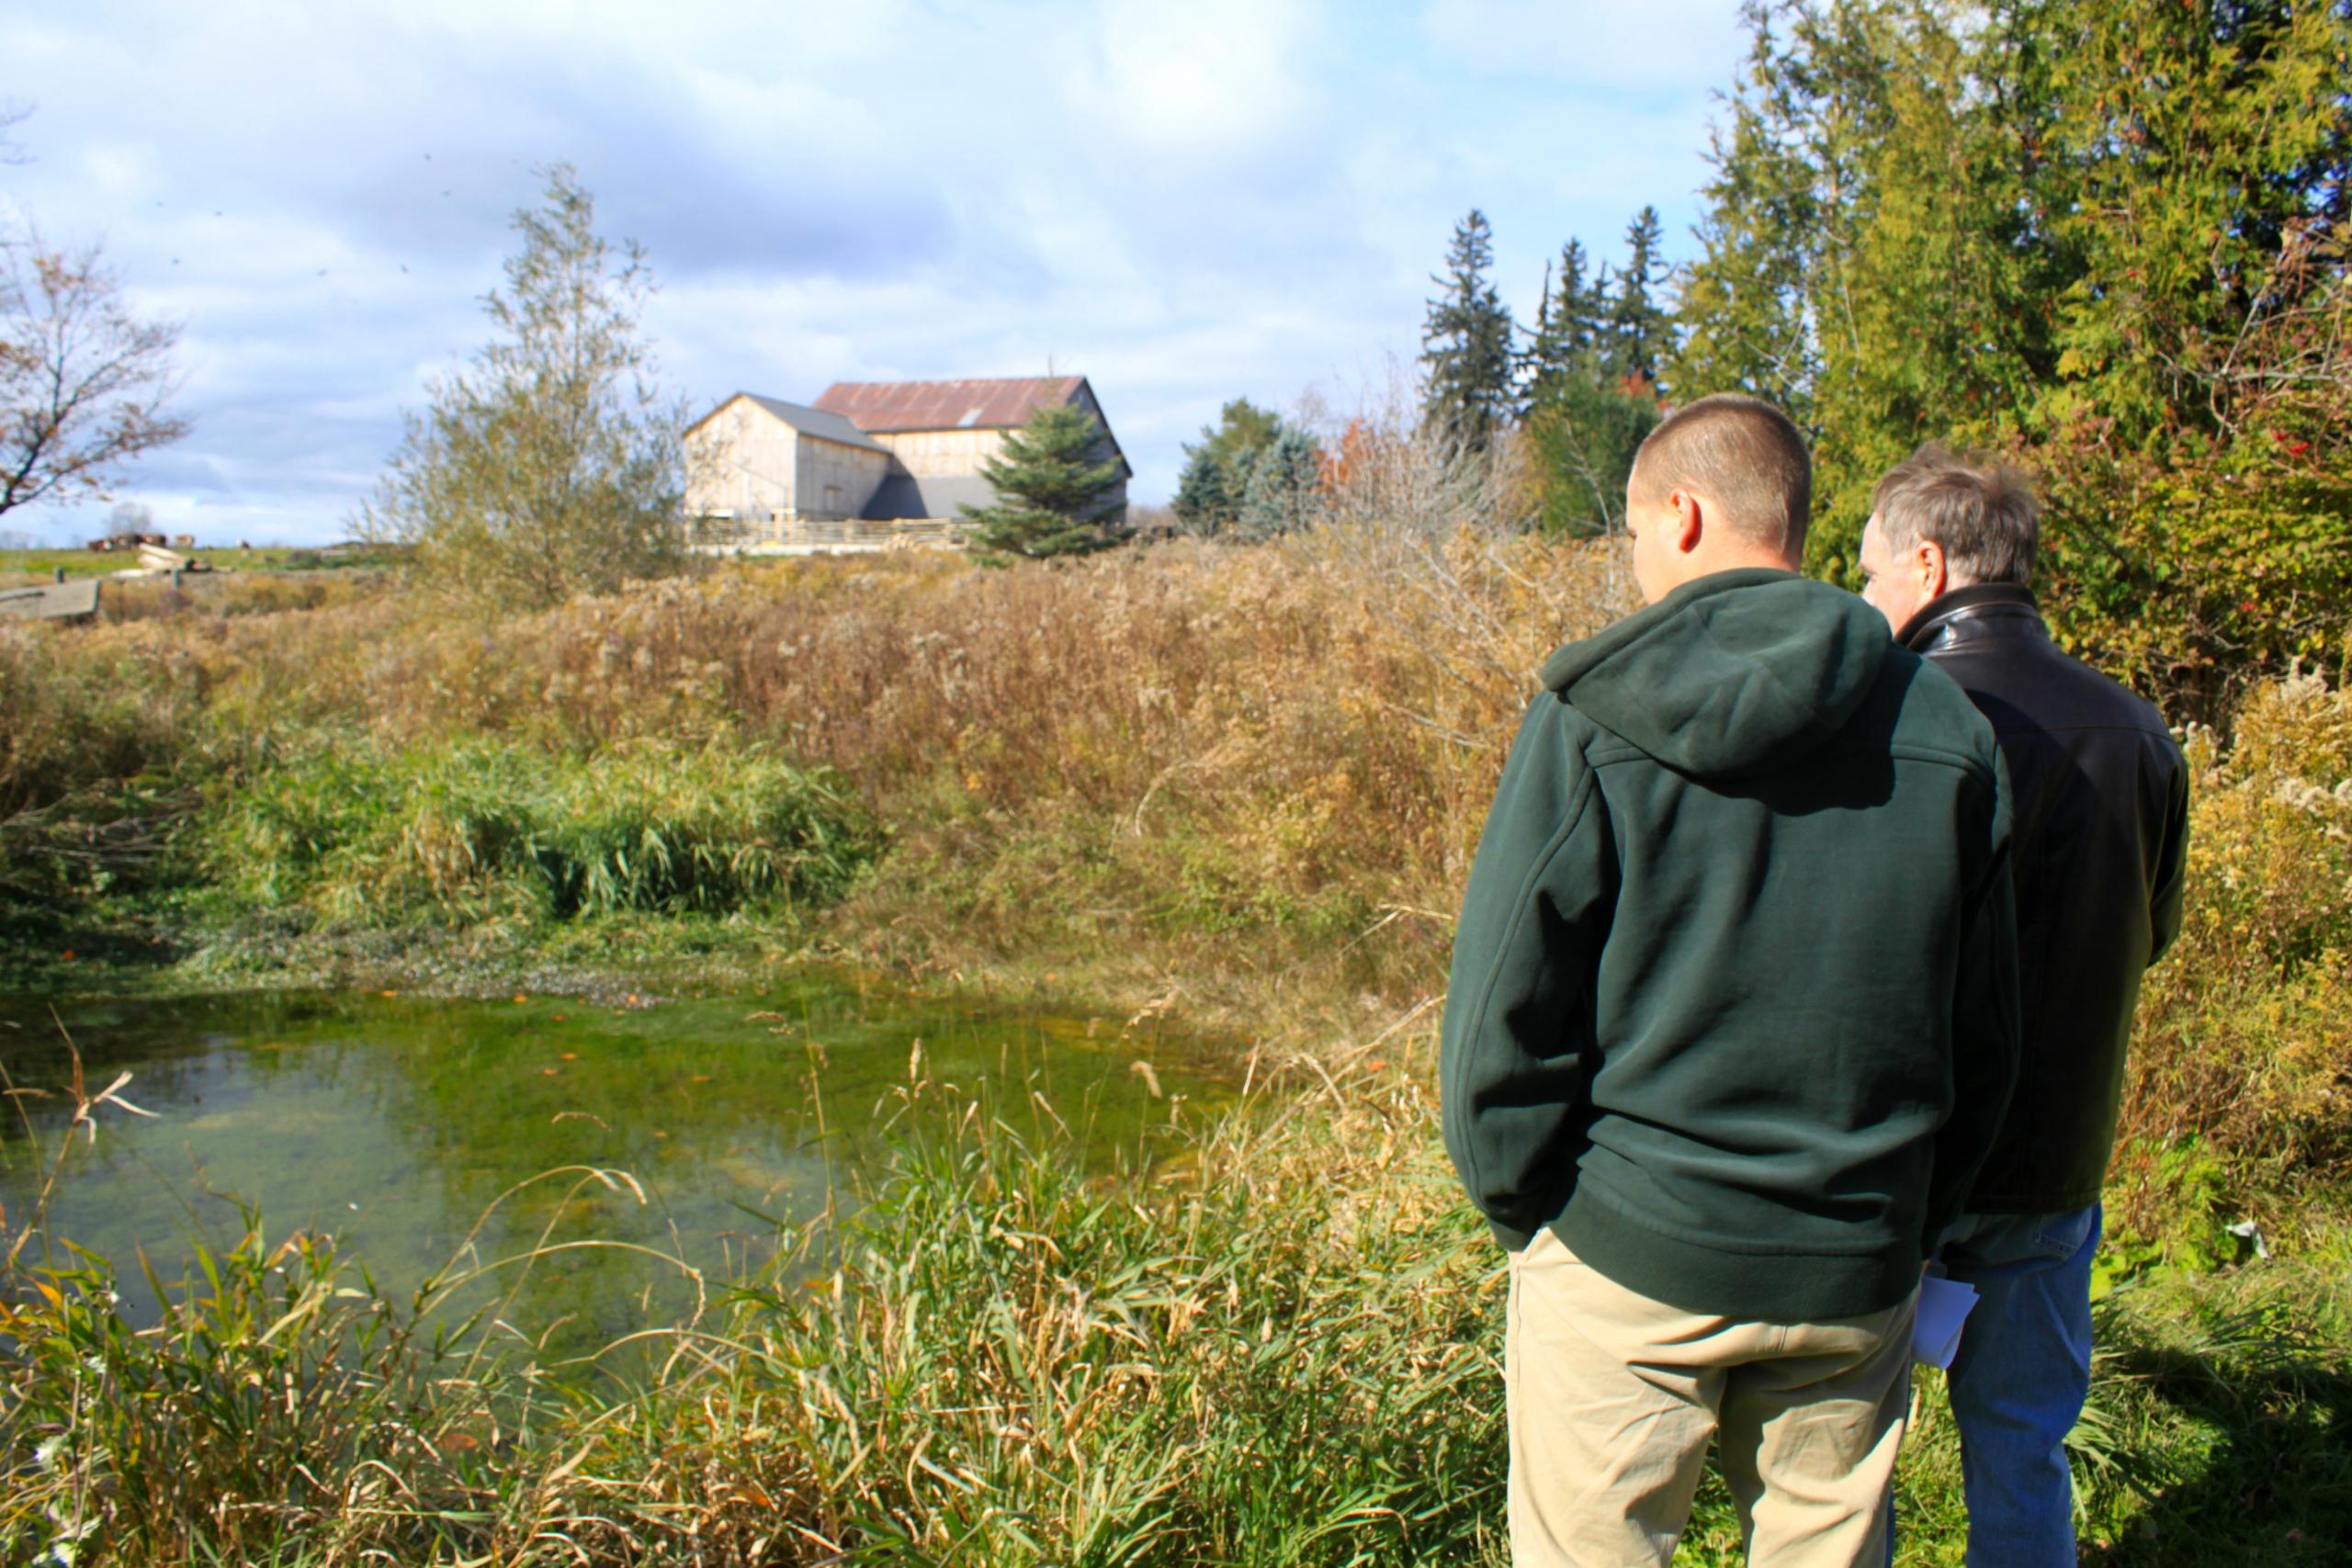 CVC staff consulting with a landowner on their farm